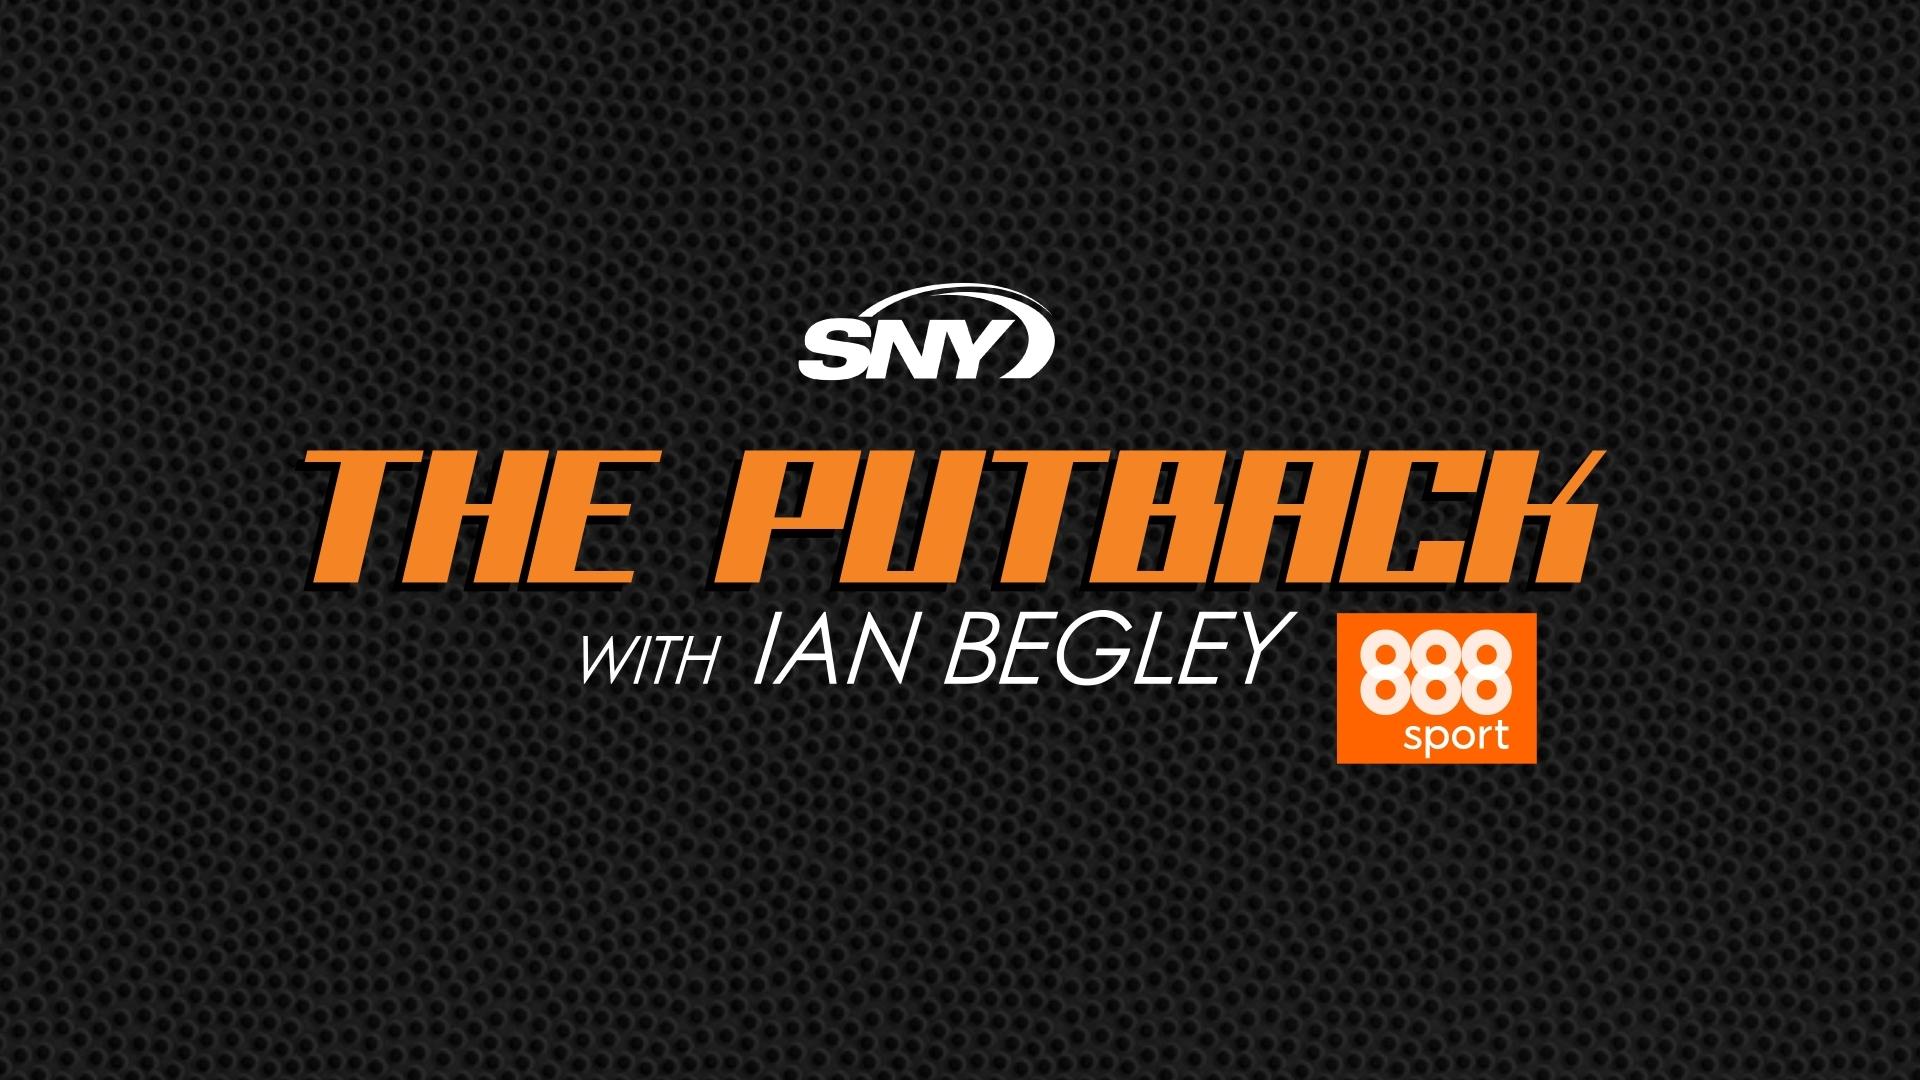 The Putback with Ian Begley